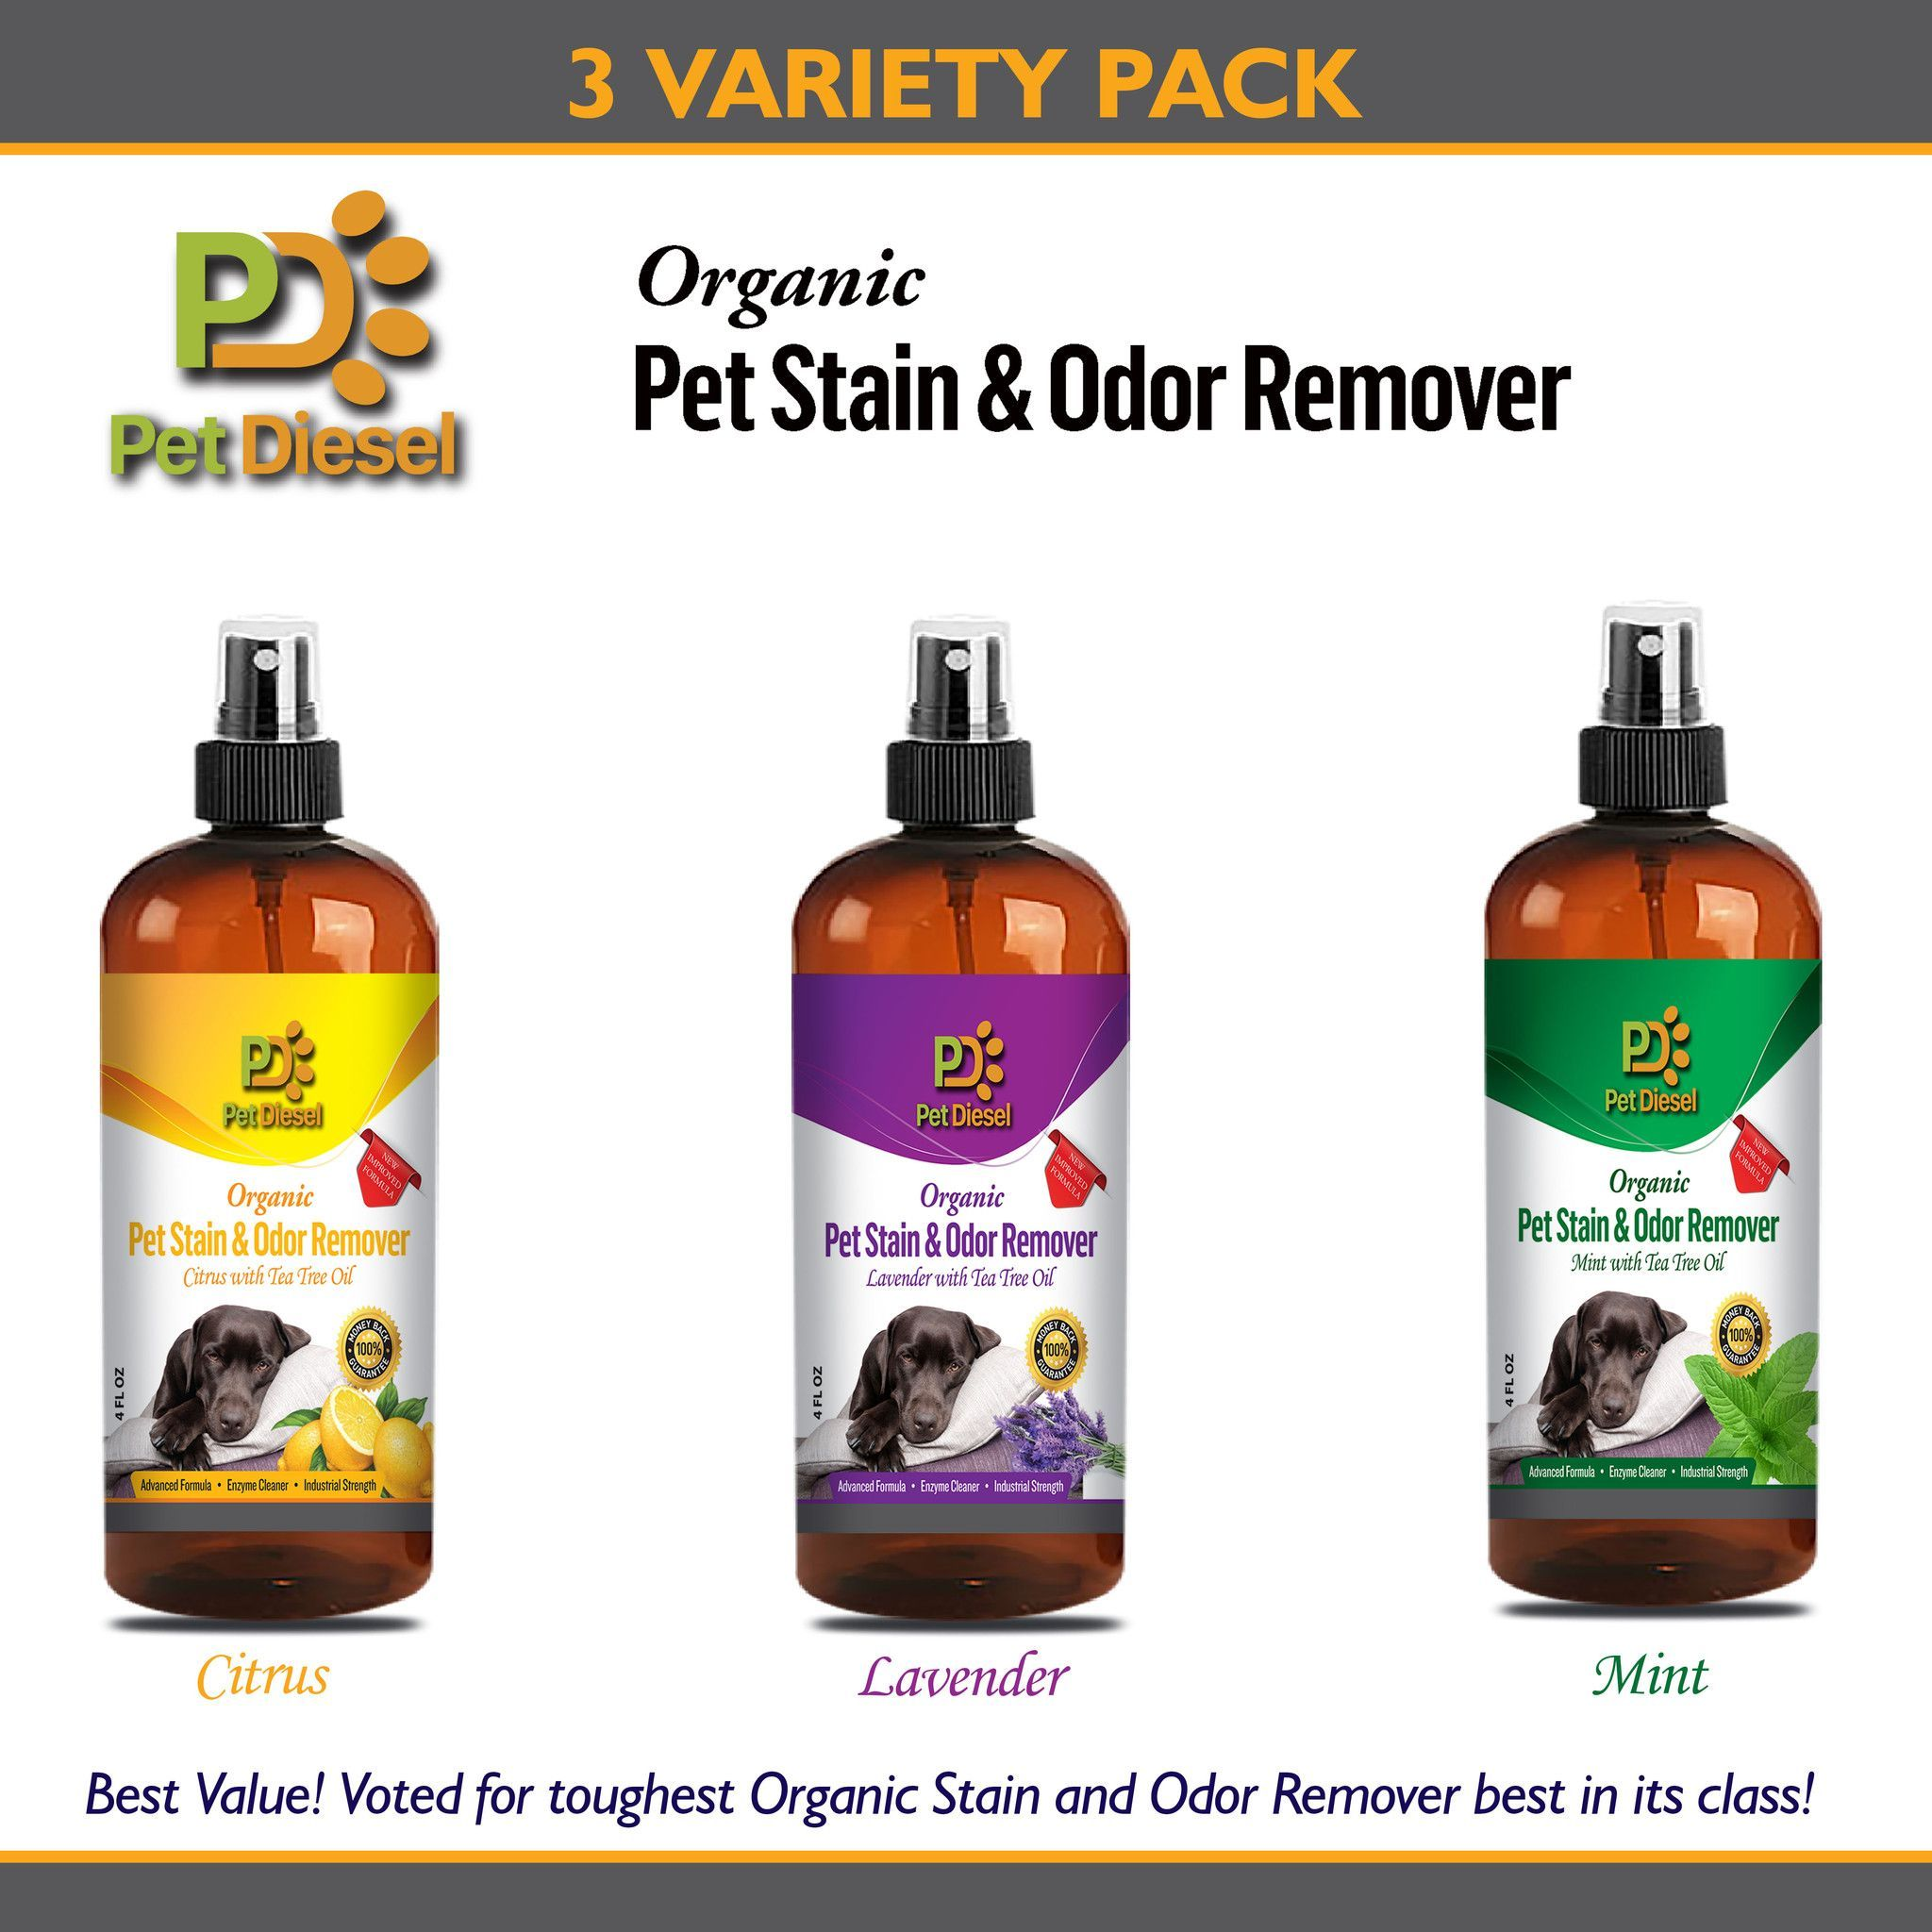 3 VARIETY PACK Pet Stain & Odor Remover Spray (Lavender